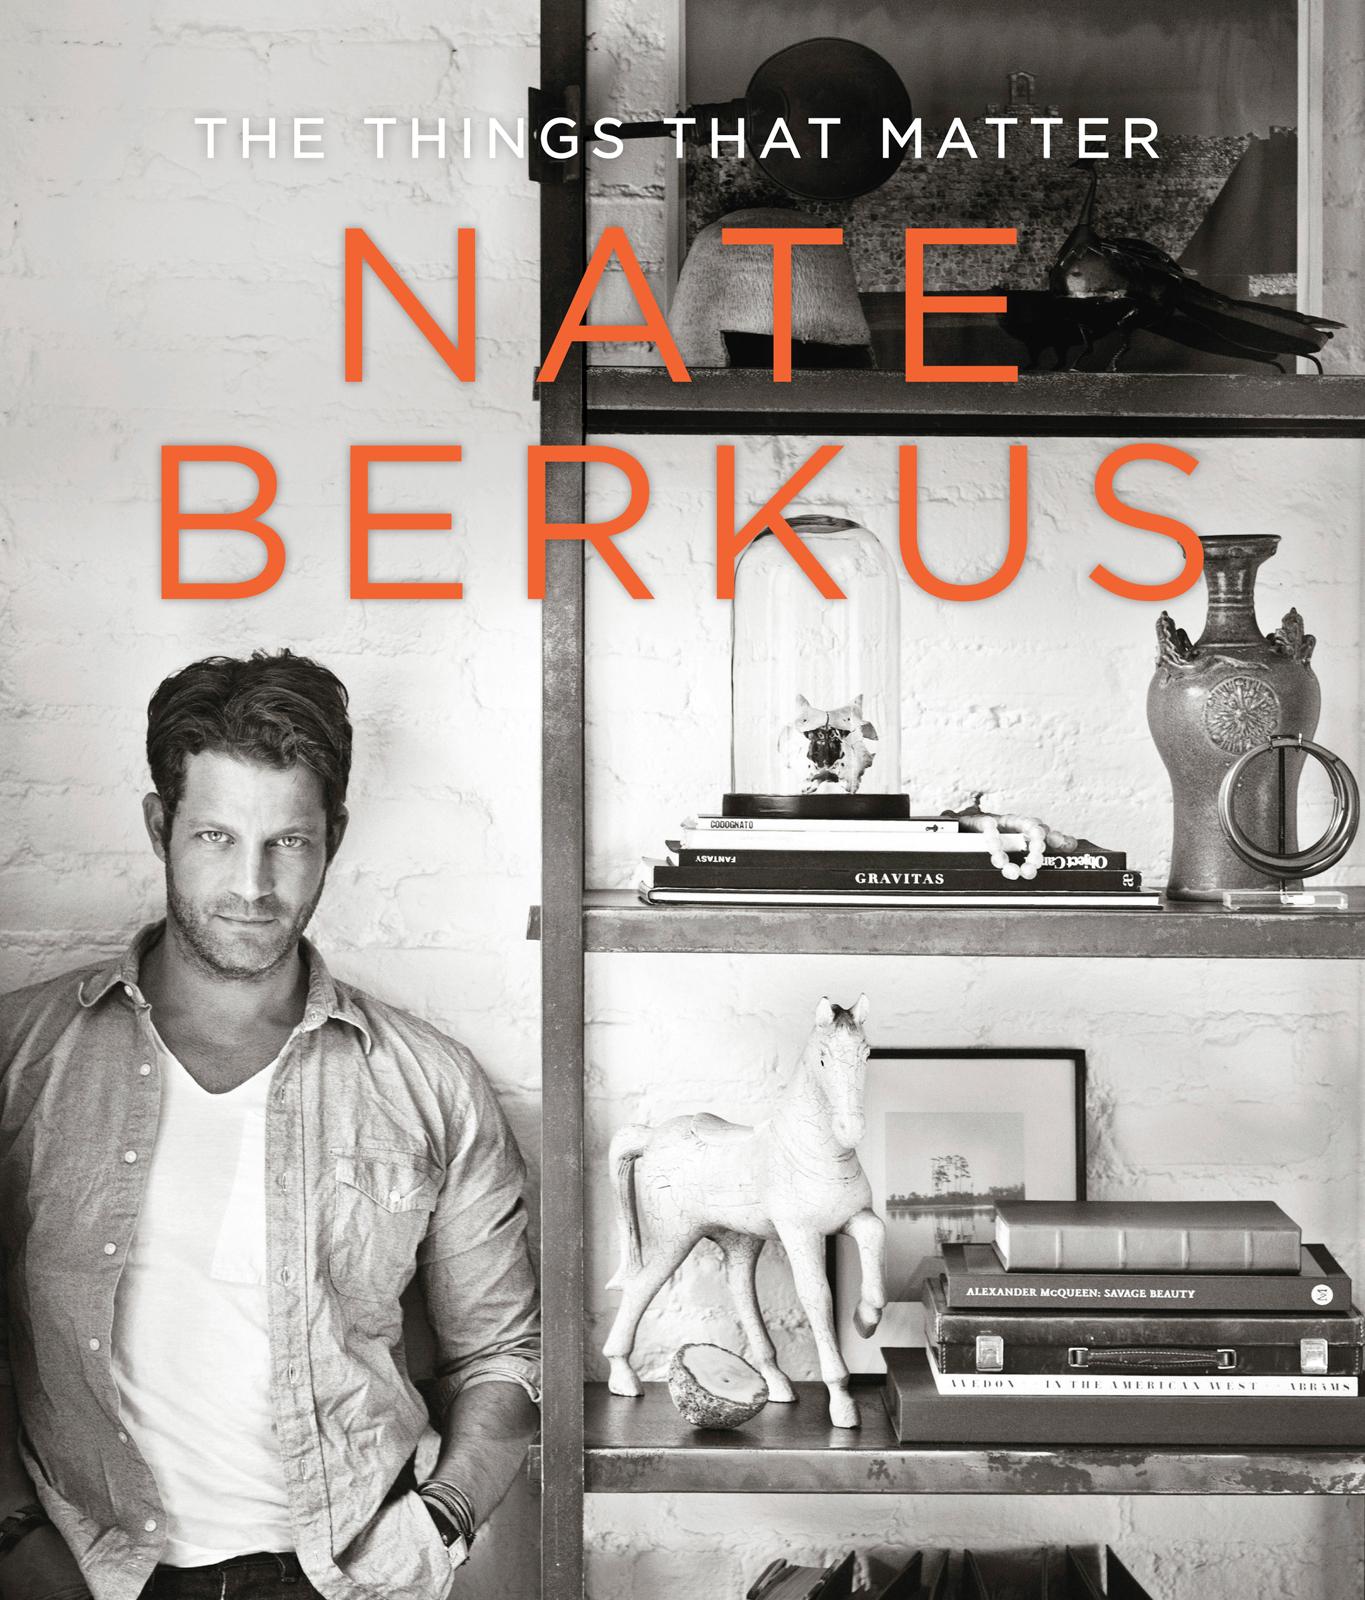 Nate Berkus The Things that Matter Book Cover